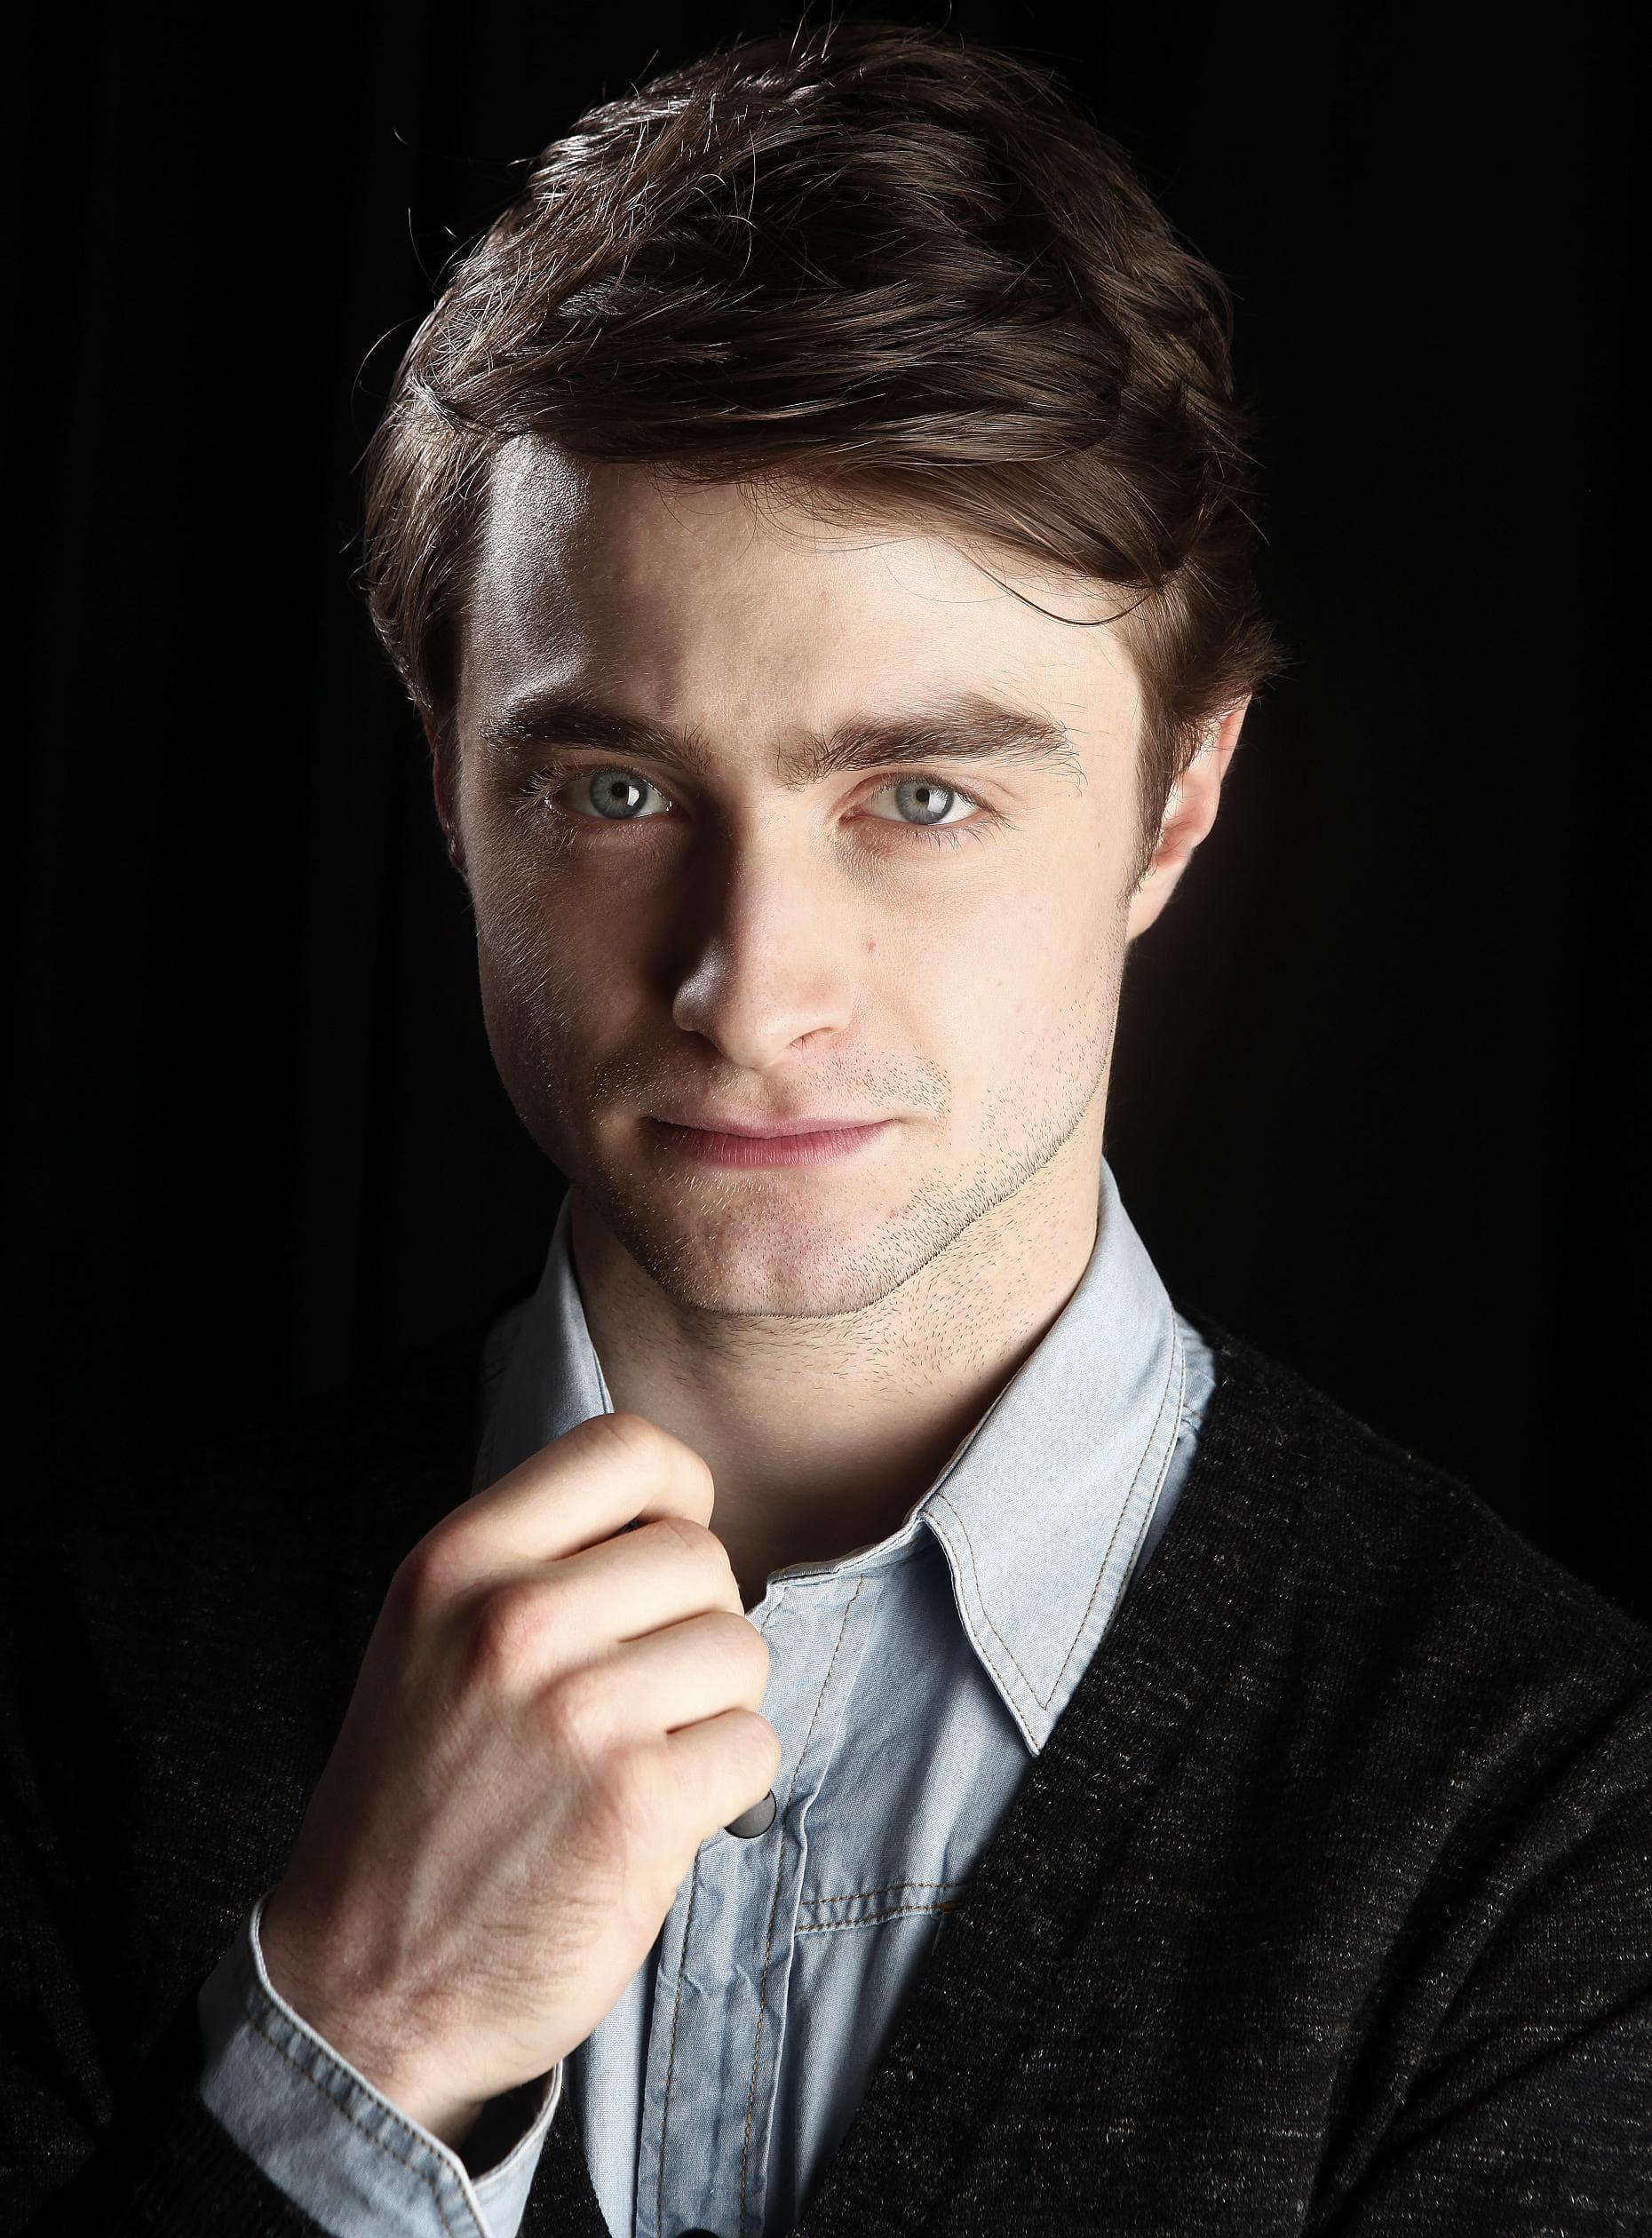 Daniel Radcliffe HQ wallpapers